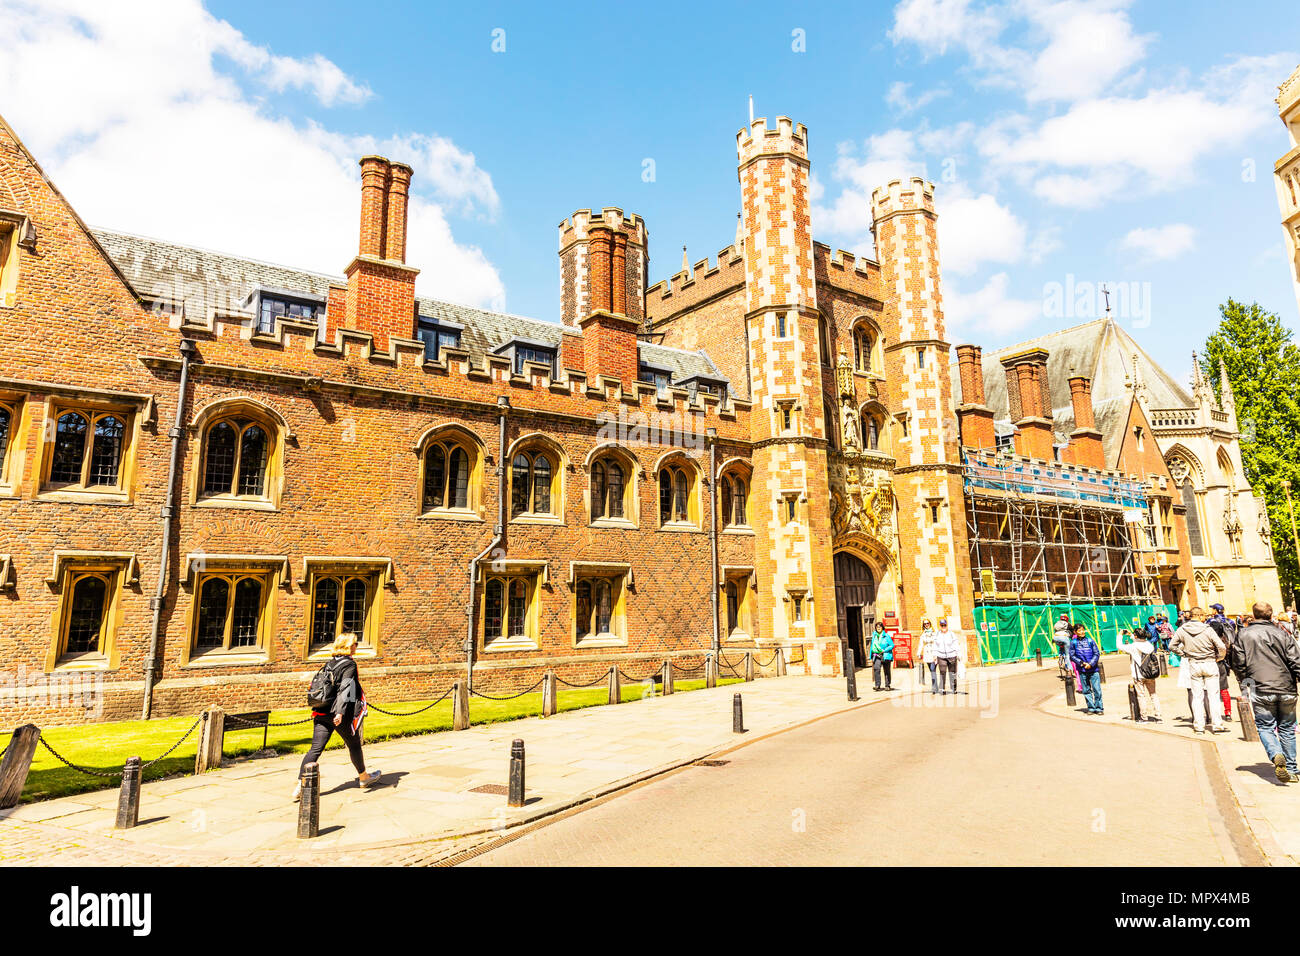 St John's College Cambridge, St John's College, Cambridge, constituent college of the University of Cambridge, Cambridge university,  colleges city, - Stock Image